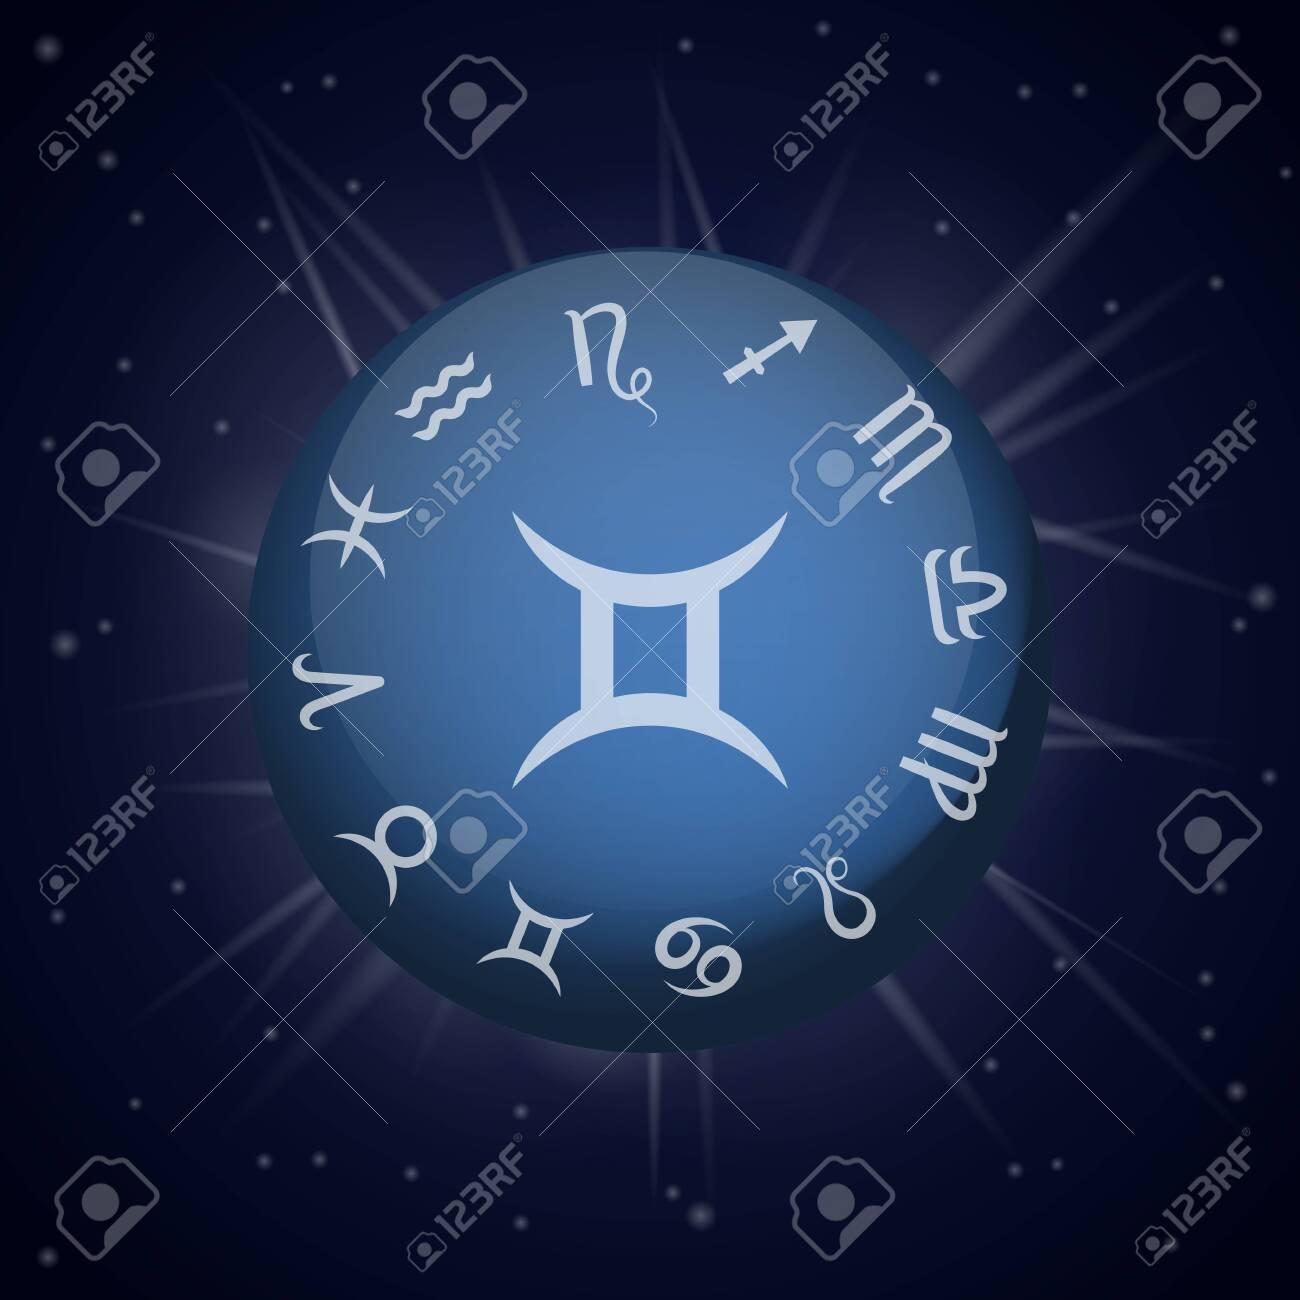 Gemini zodiac sign  Astrological horoscope  Vector illustration